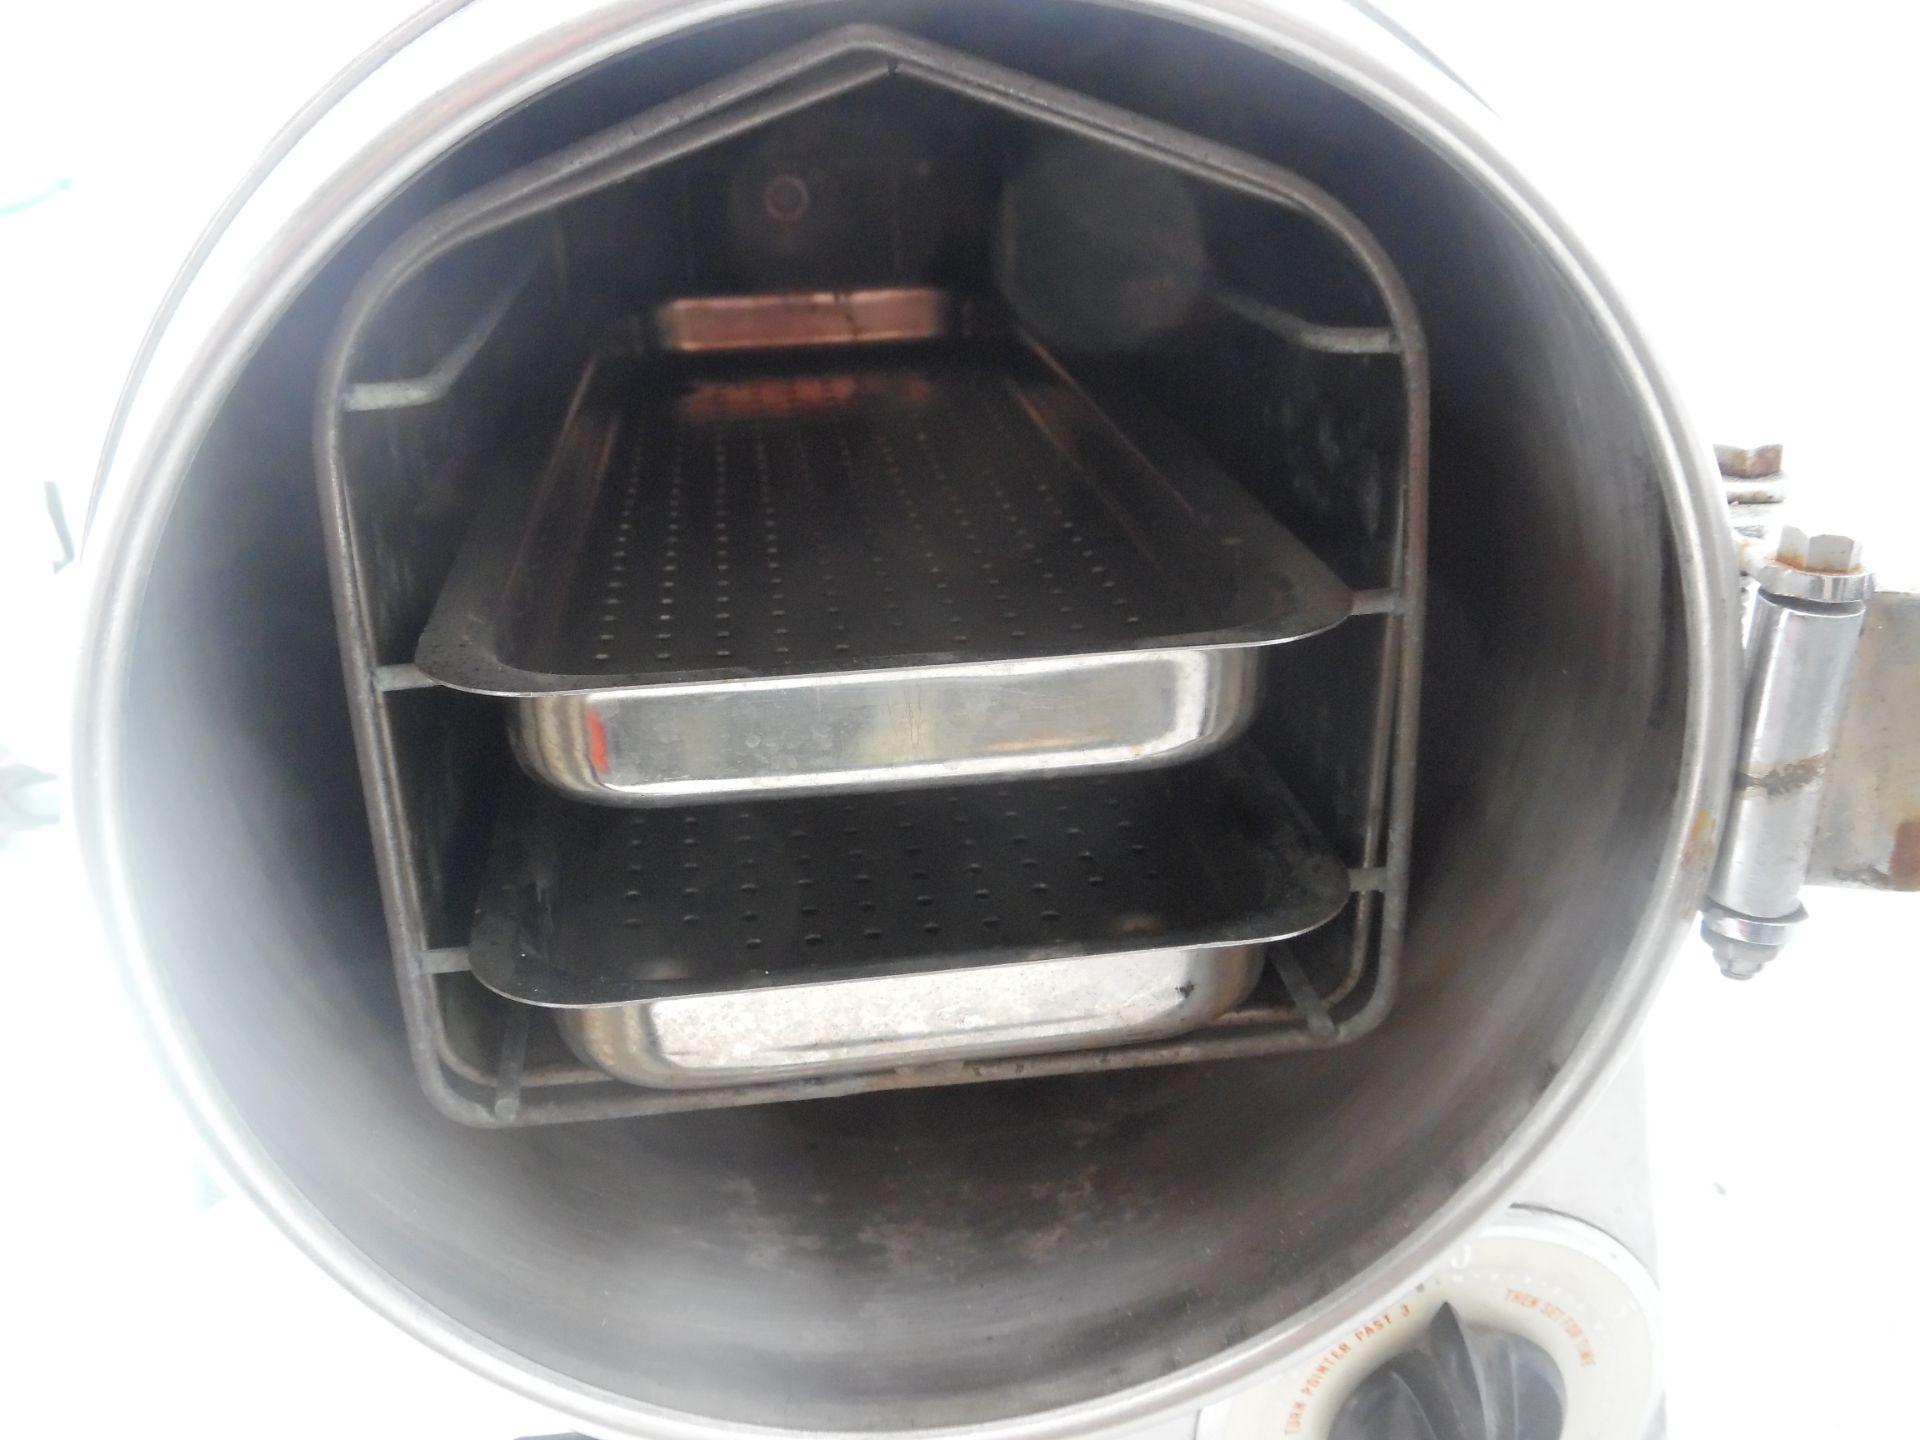 Castle Model 777 Autoclave Sterilizer.110V 10 amps. - Image 4 of 4